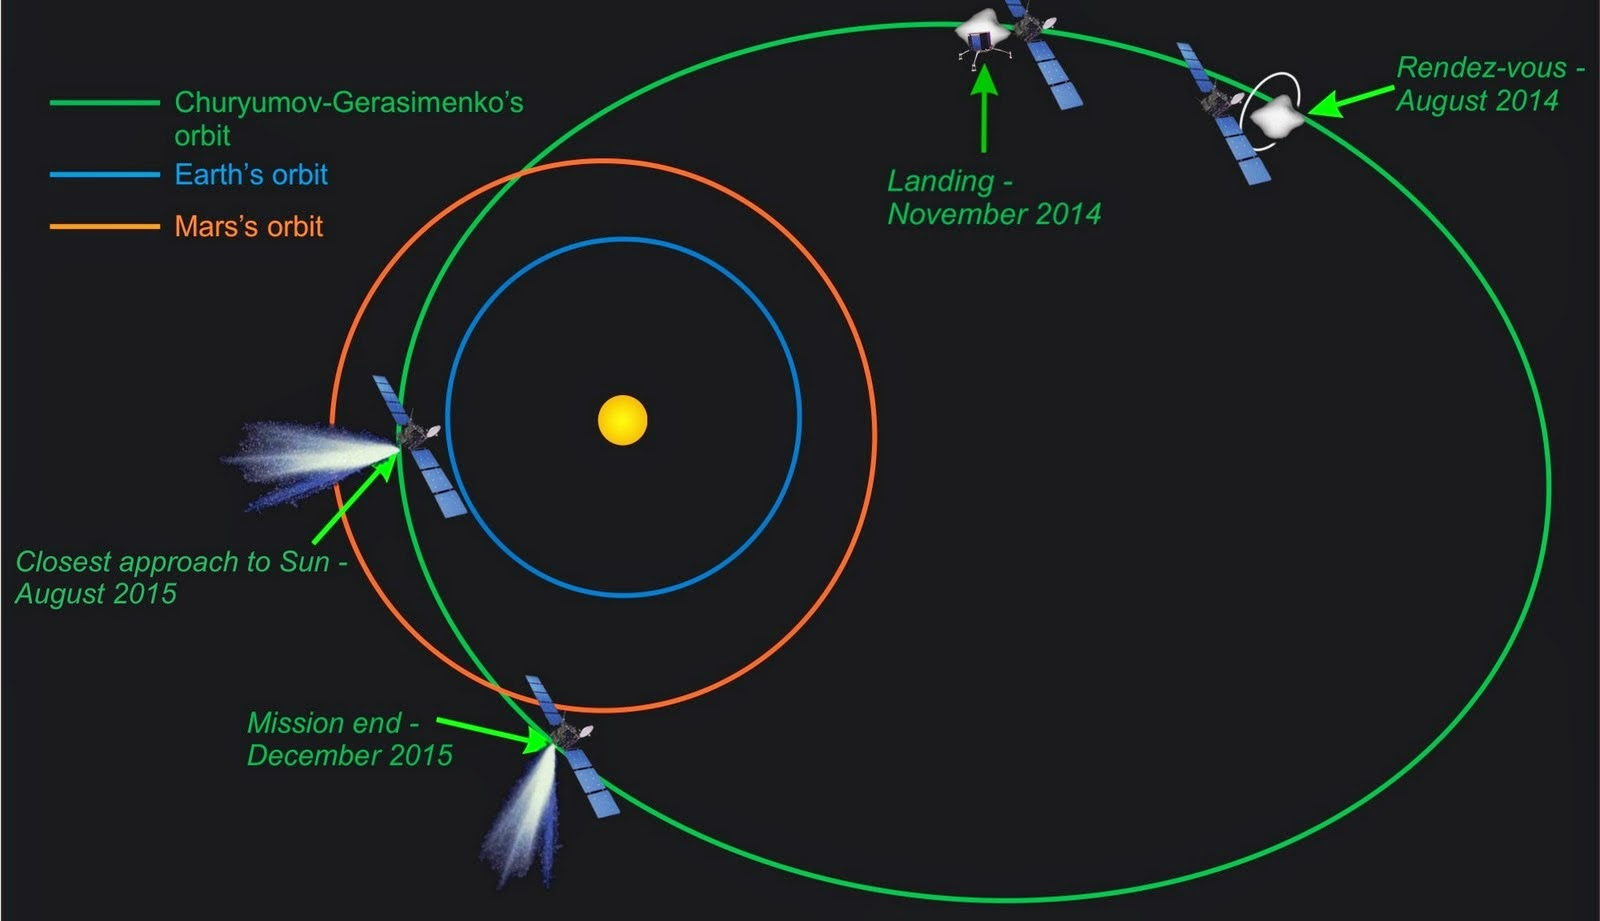 sonde+rosetta+probe+chury